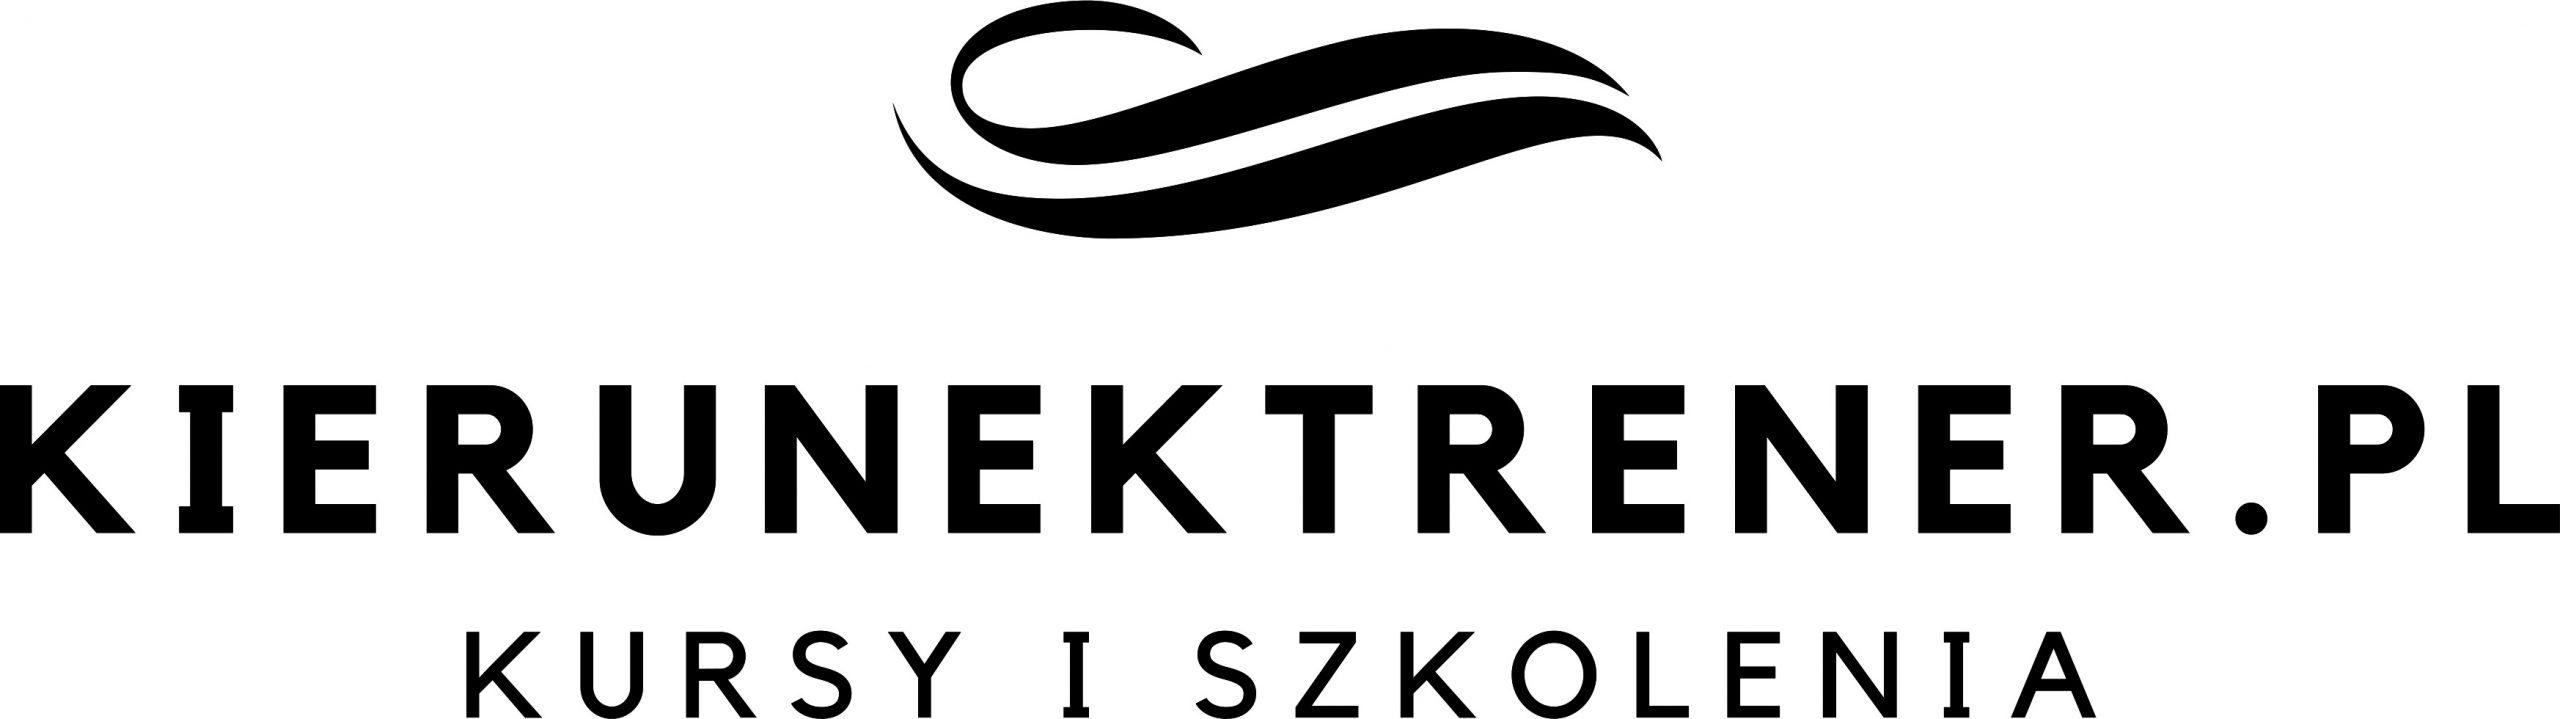 logo portal Kierunek Trener